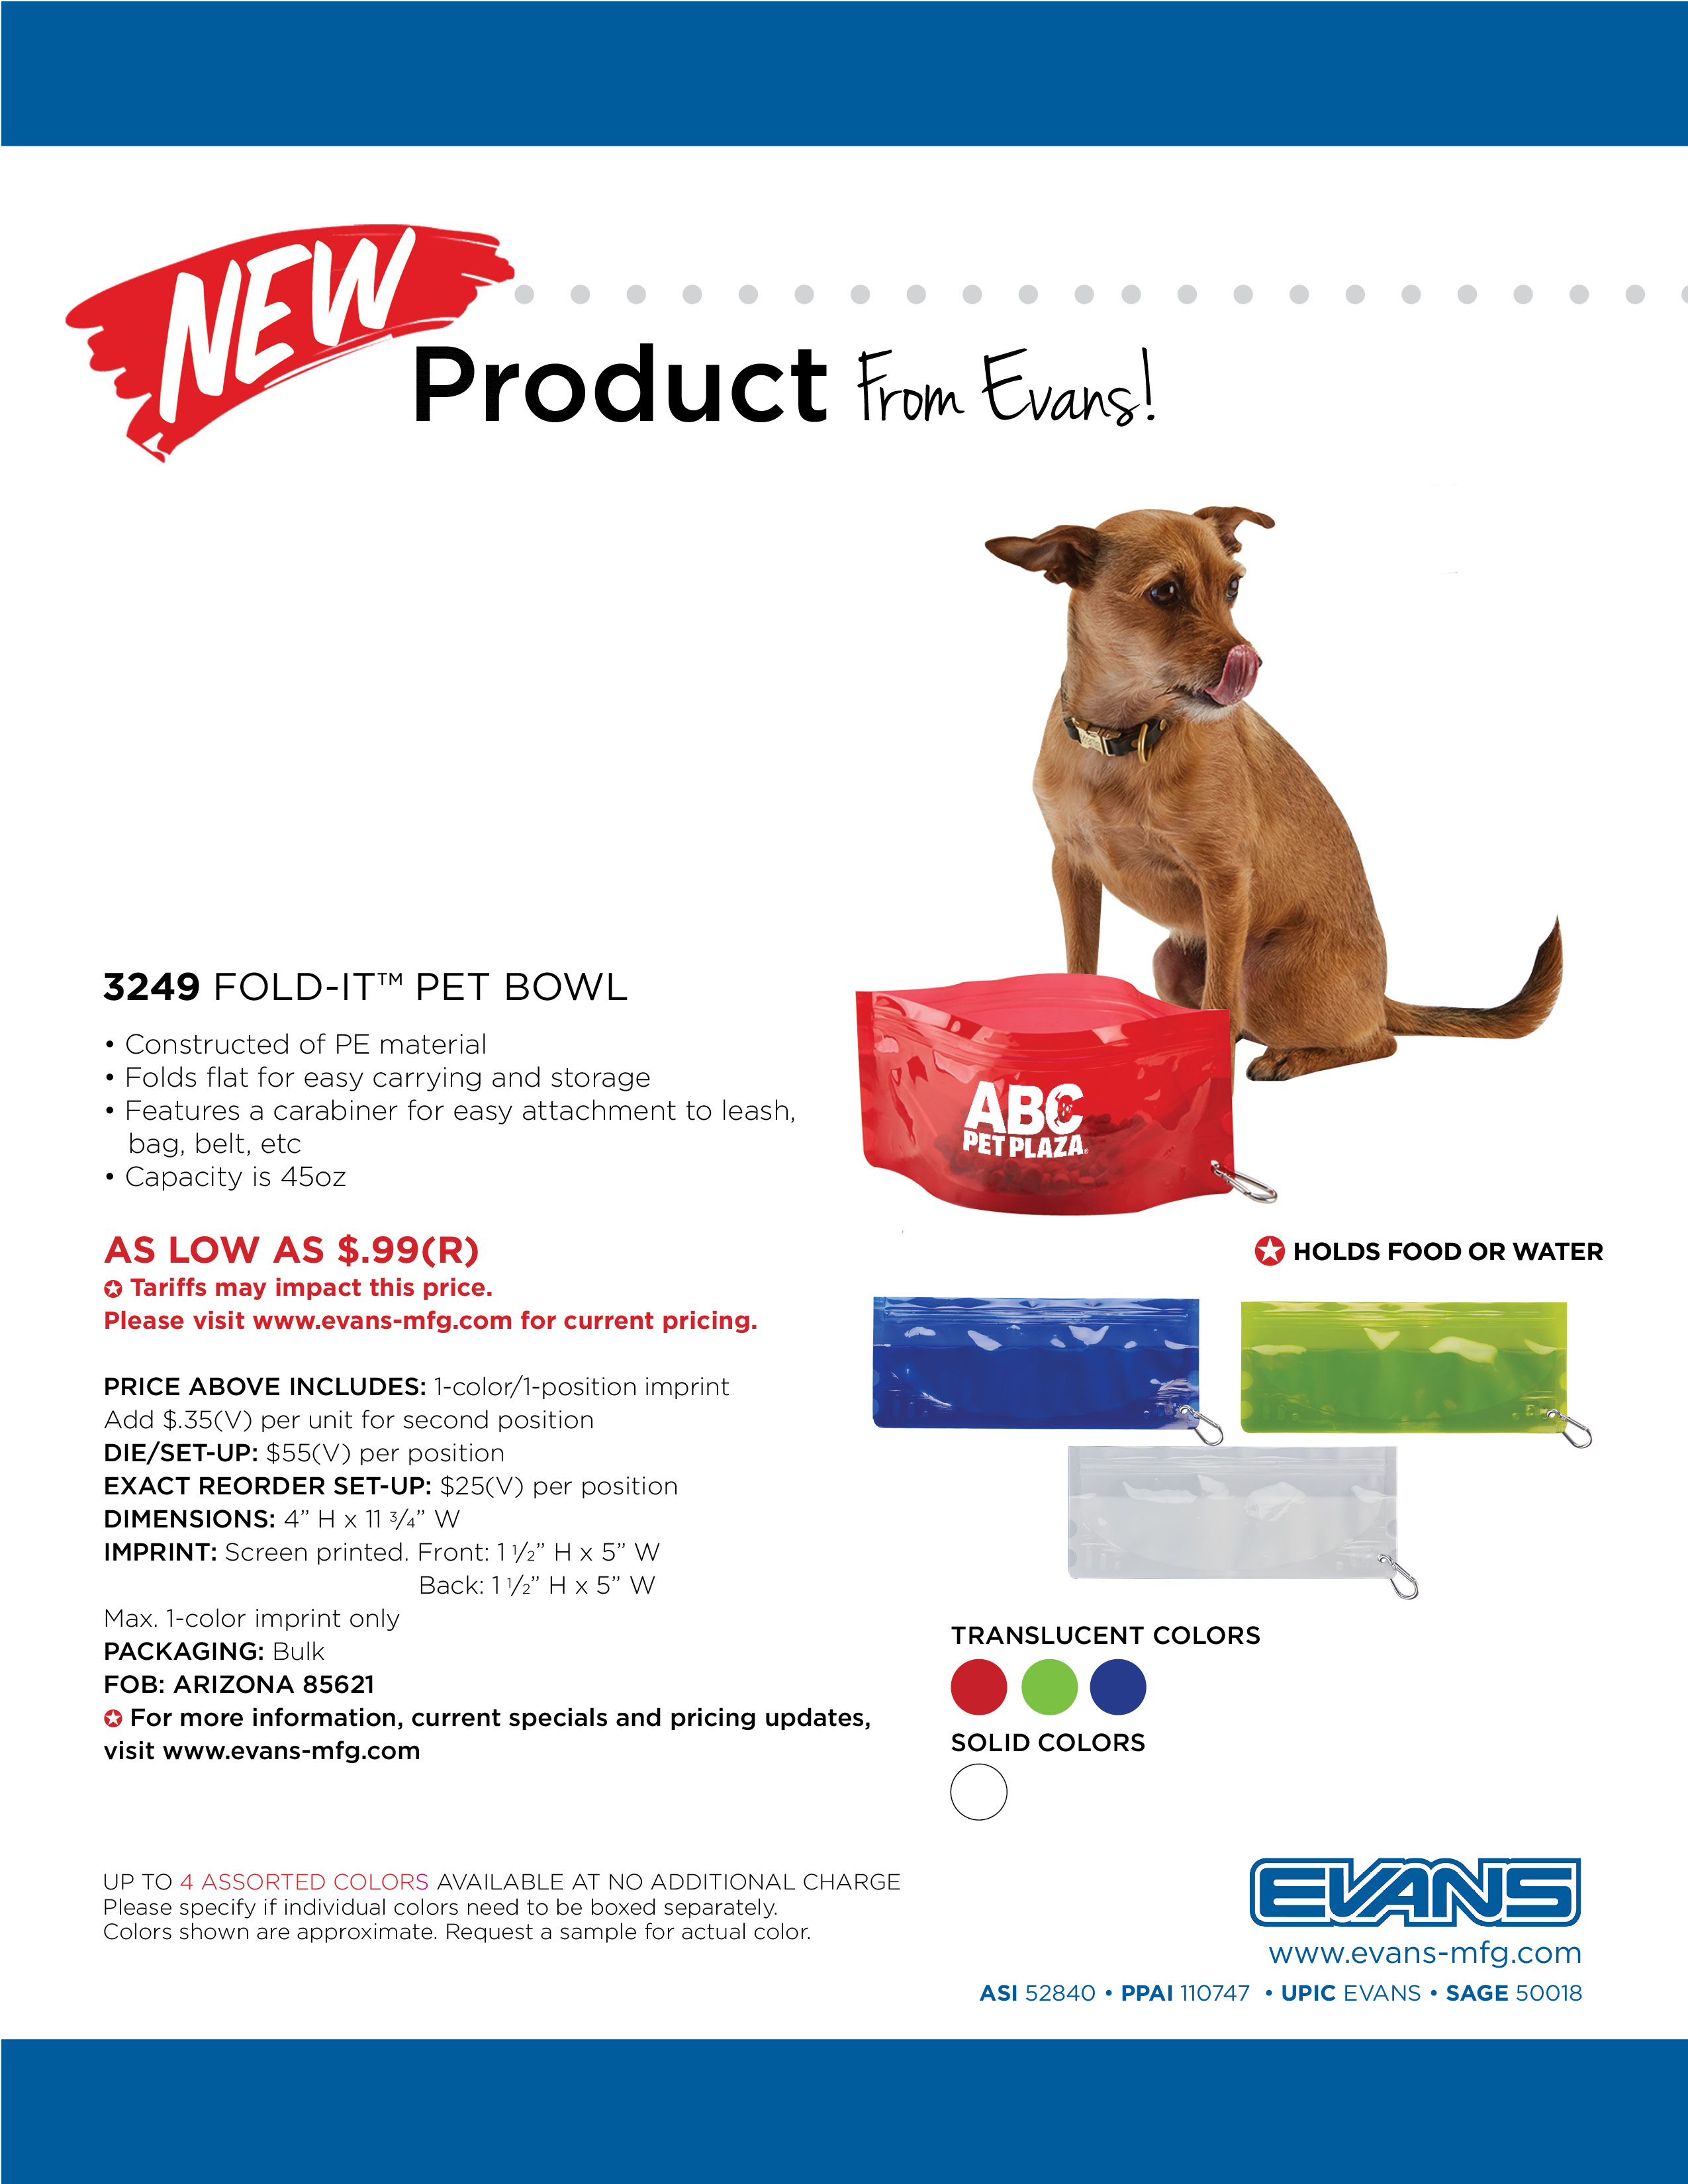 3249 Fold-It™ Pet Bowl